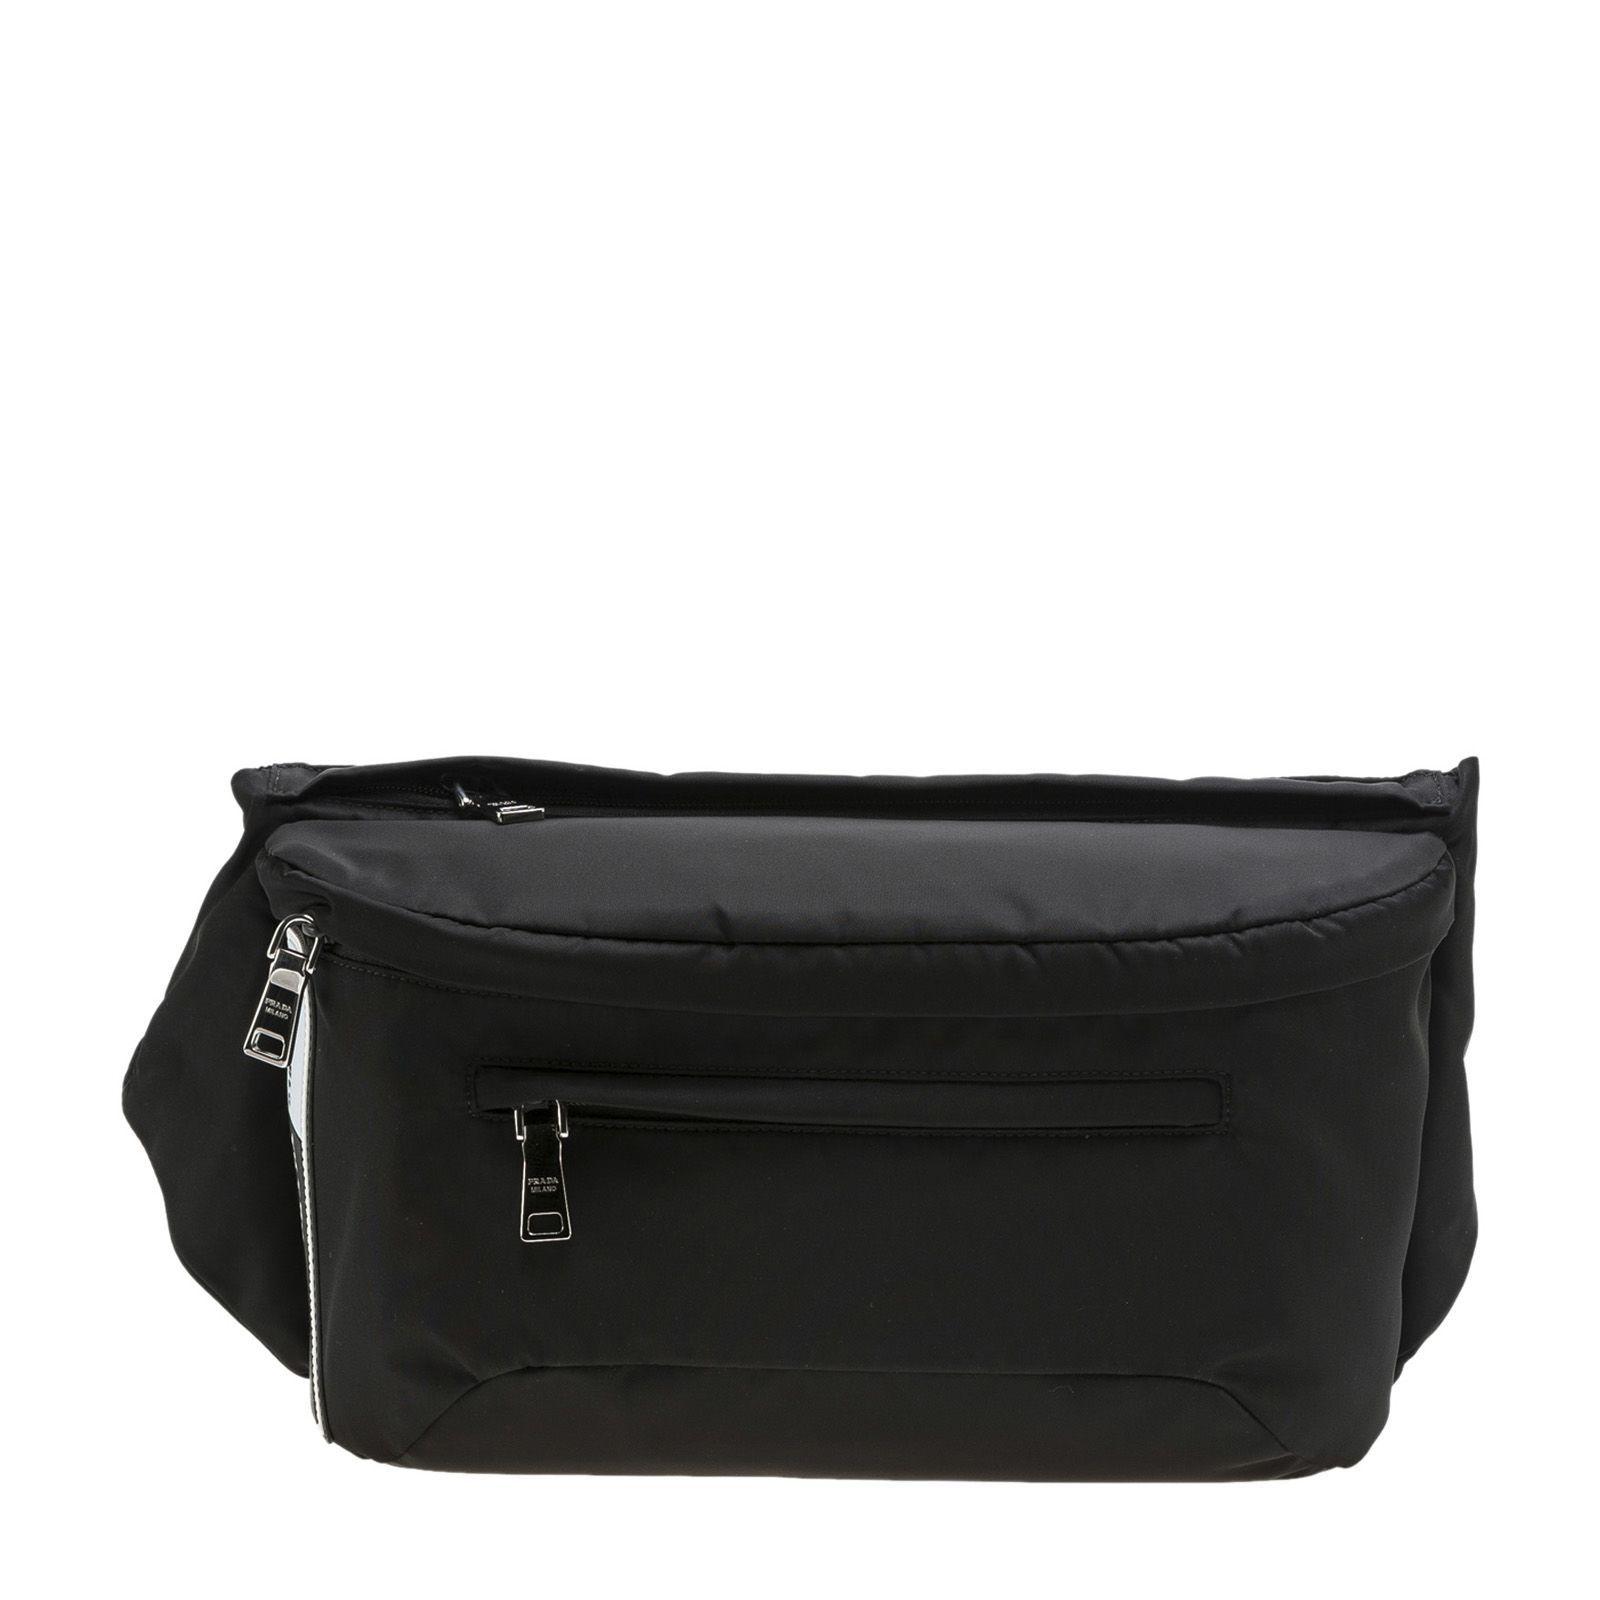 e2c6ed9cc1fc PRADA FANNY PACK.  prada  bags  belt bags  nylon